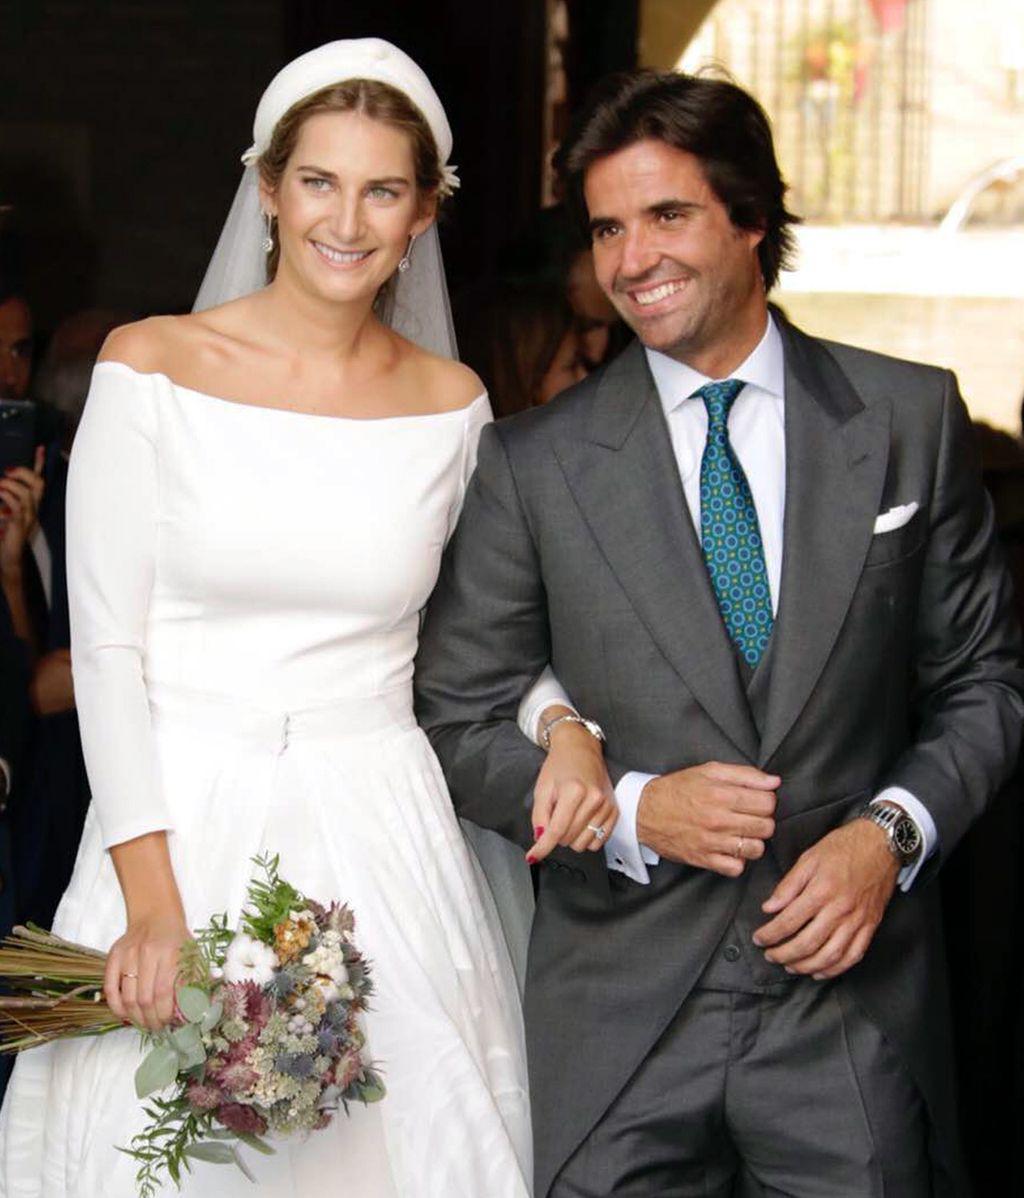 La boda de Sibi Montes, hermana de Lourdes Montes, foto a foto